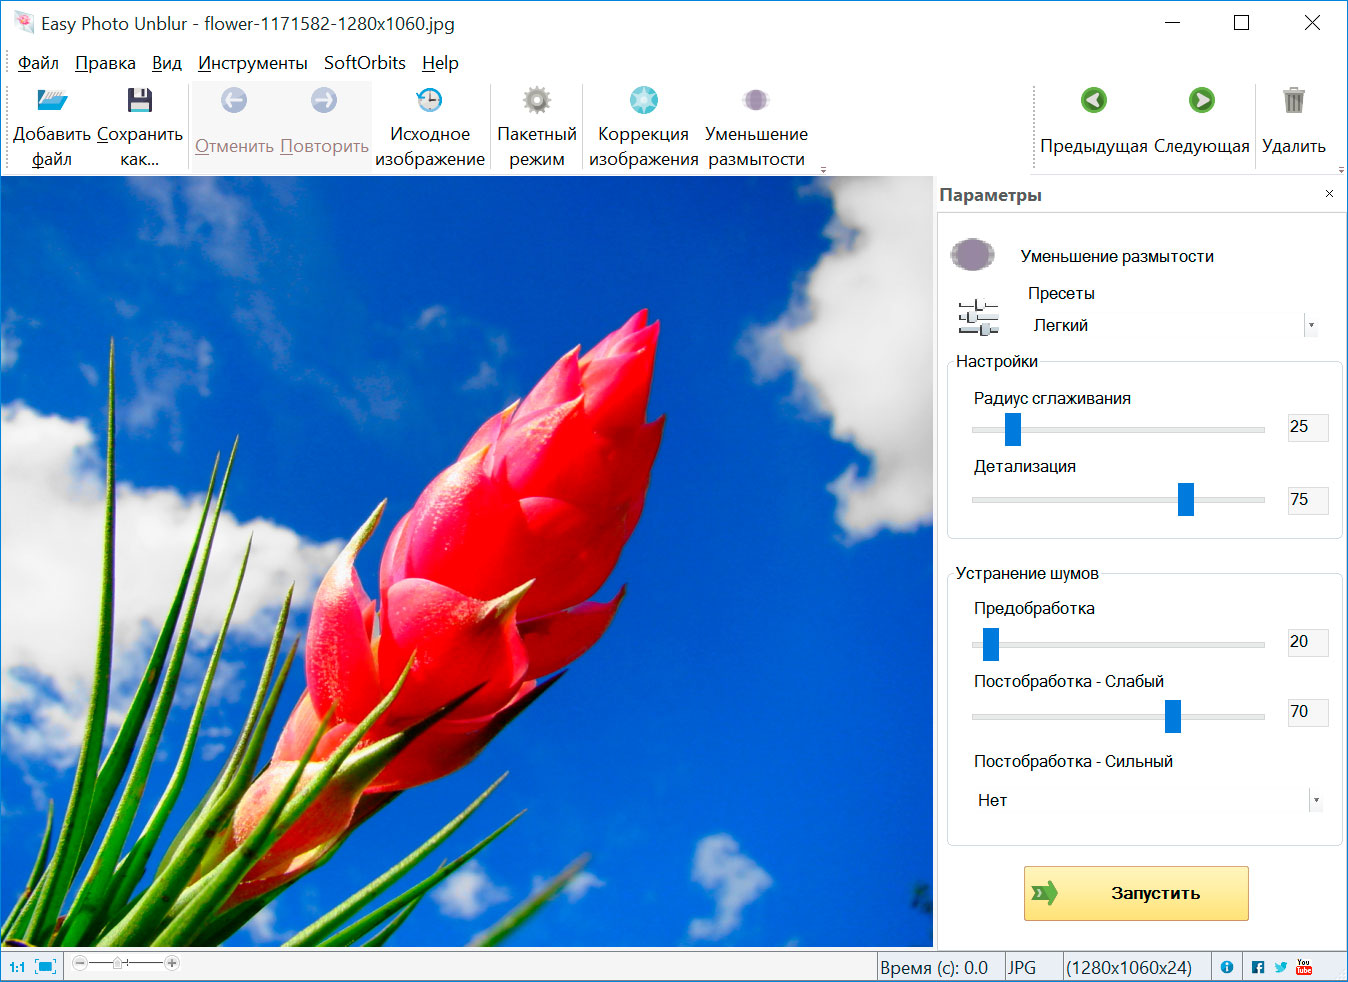 Easy Photo Unblur Снимки экрана